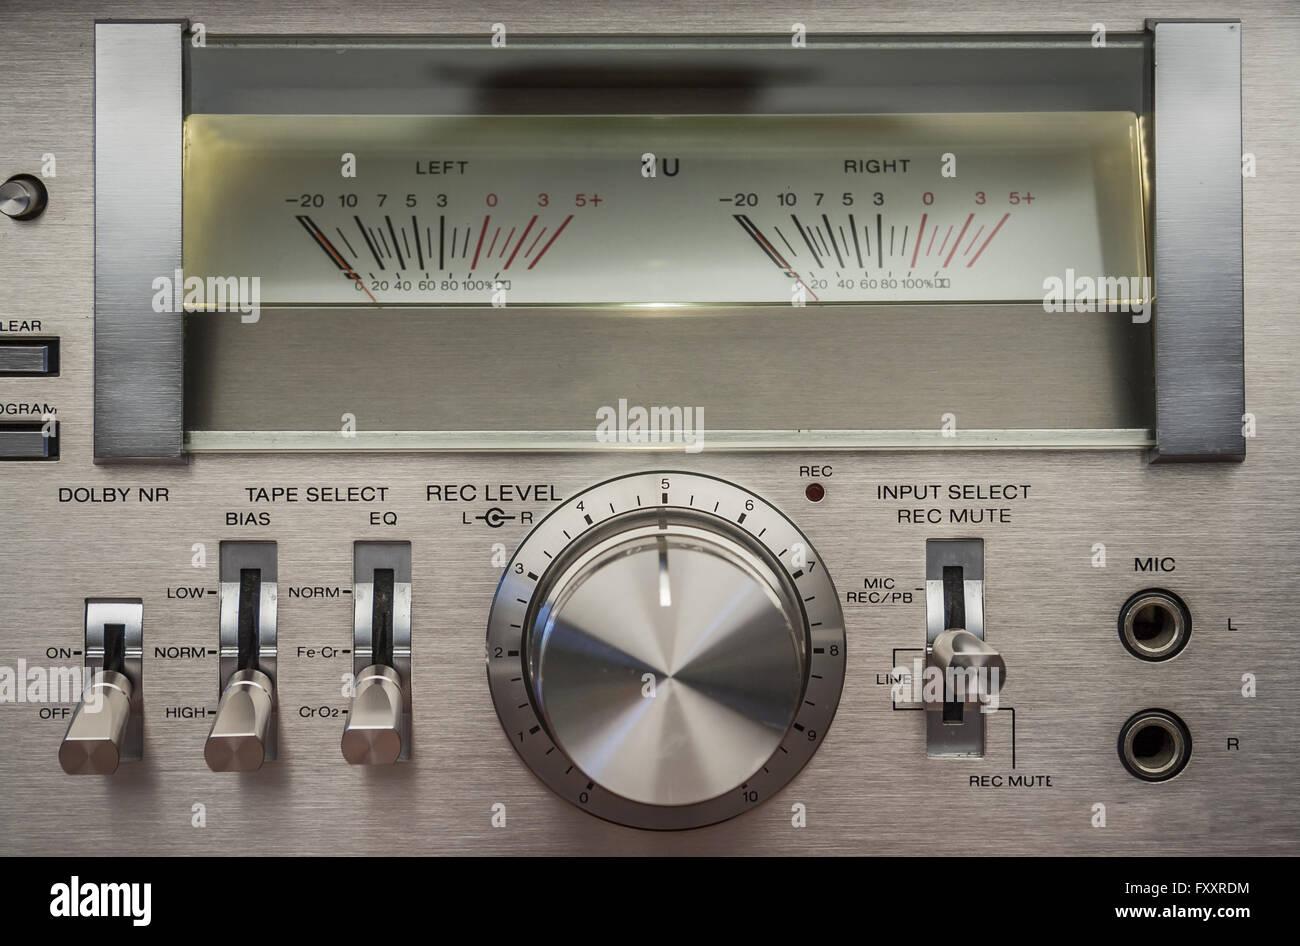 Vintage Cassette Recorder - Stock Image